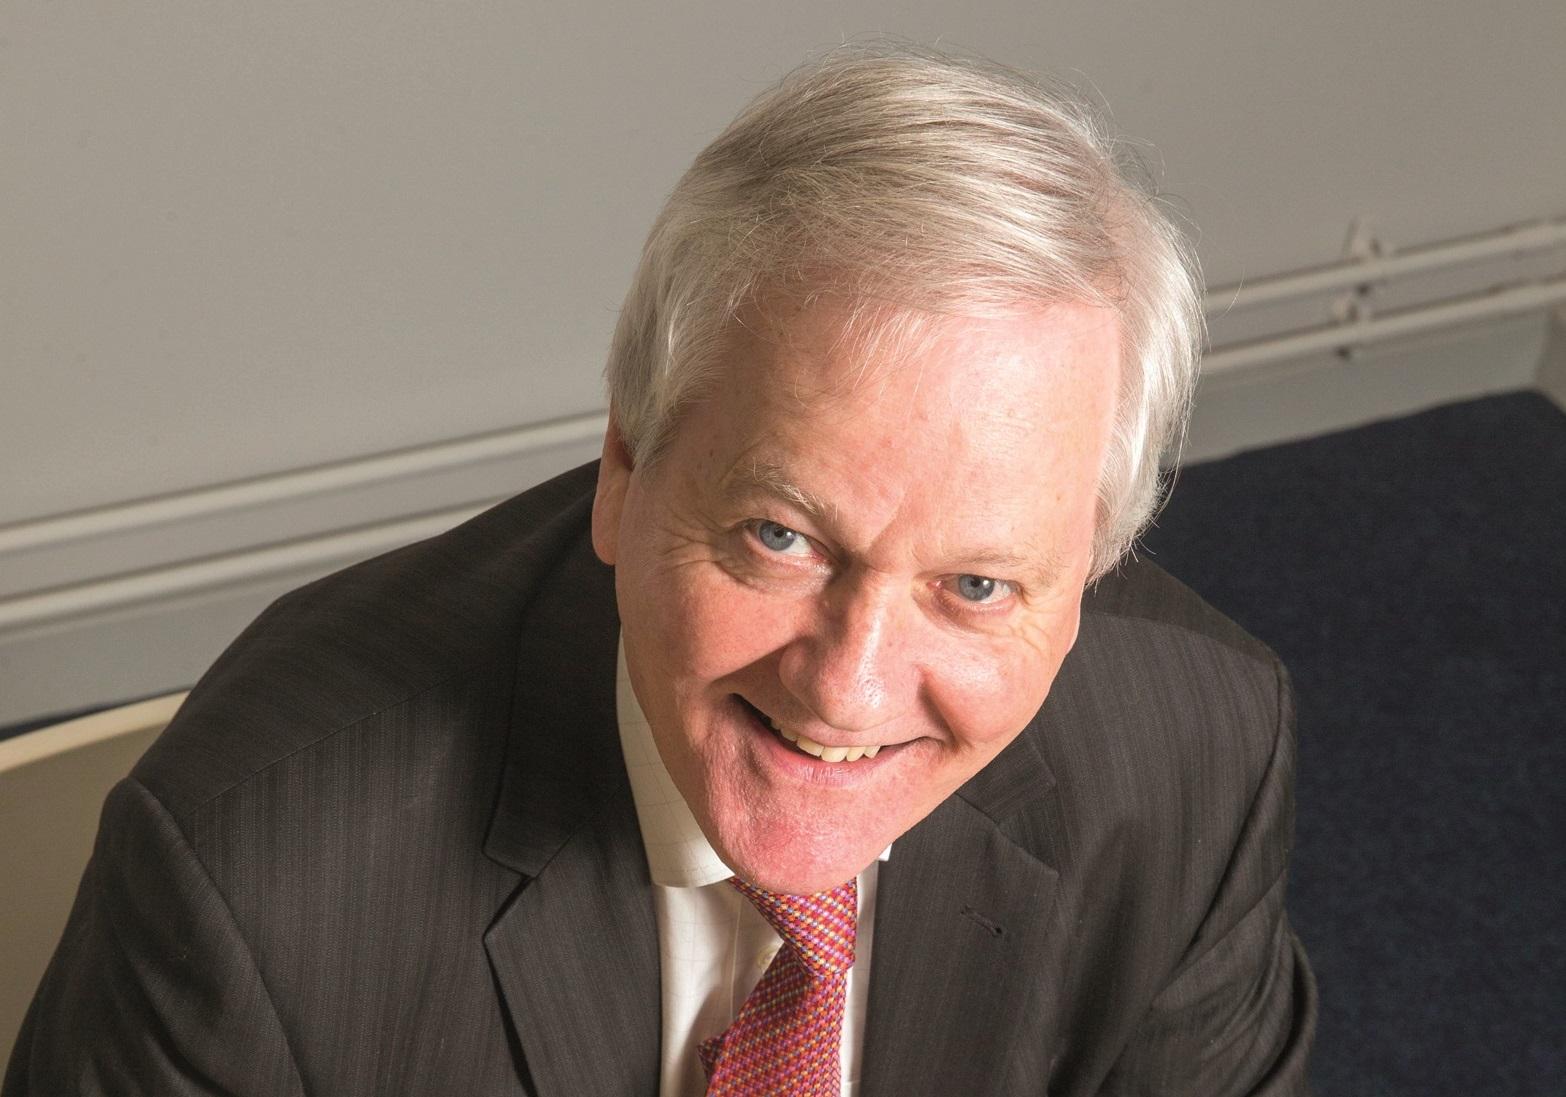 2. Graham Bell – Chief executive, Kibble